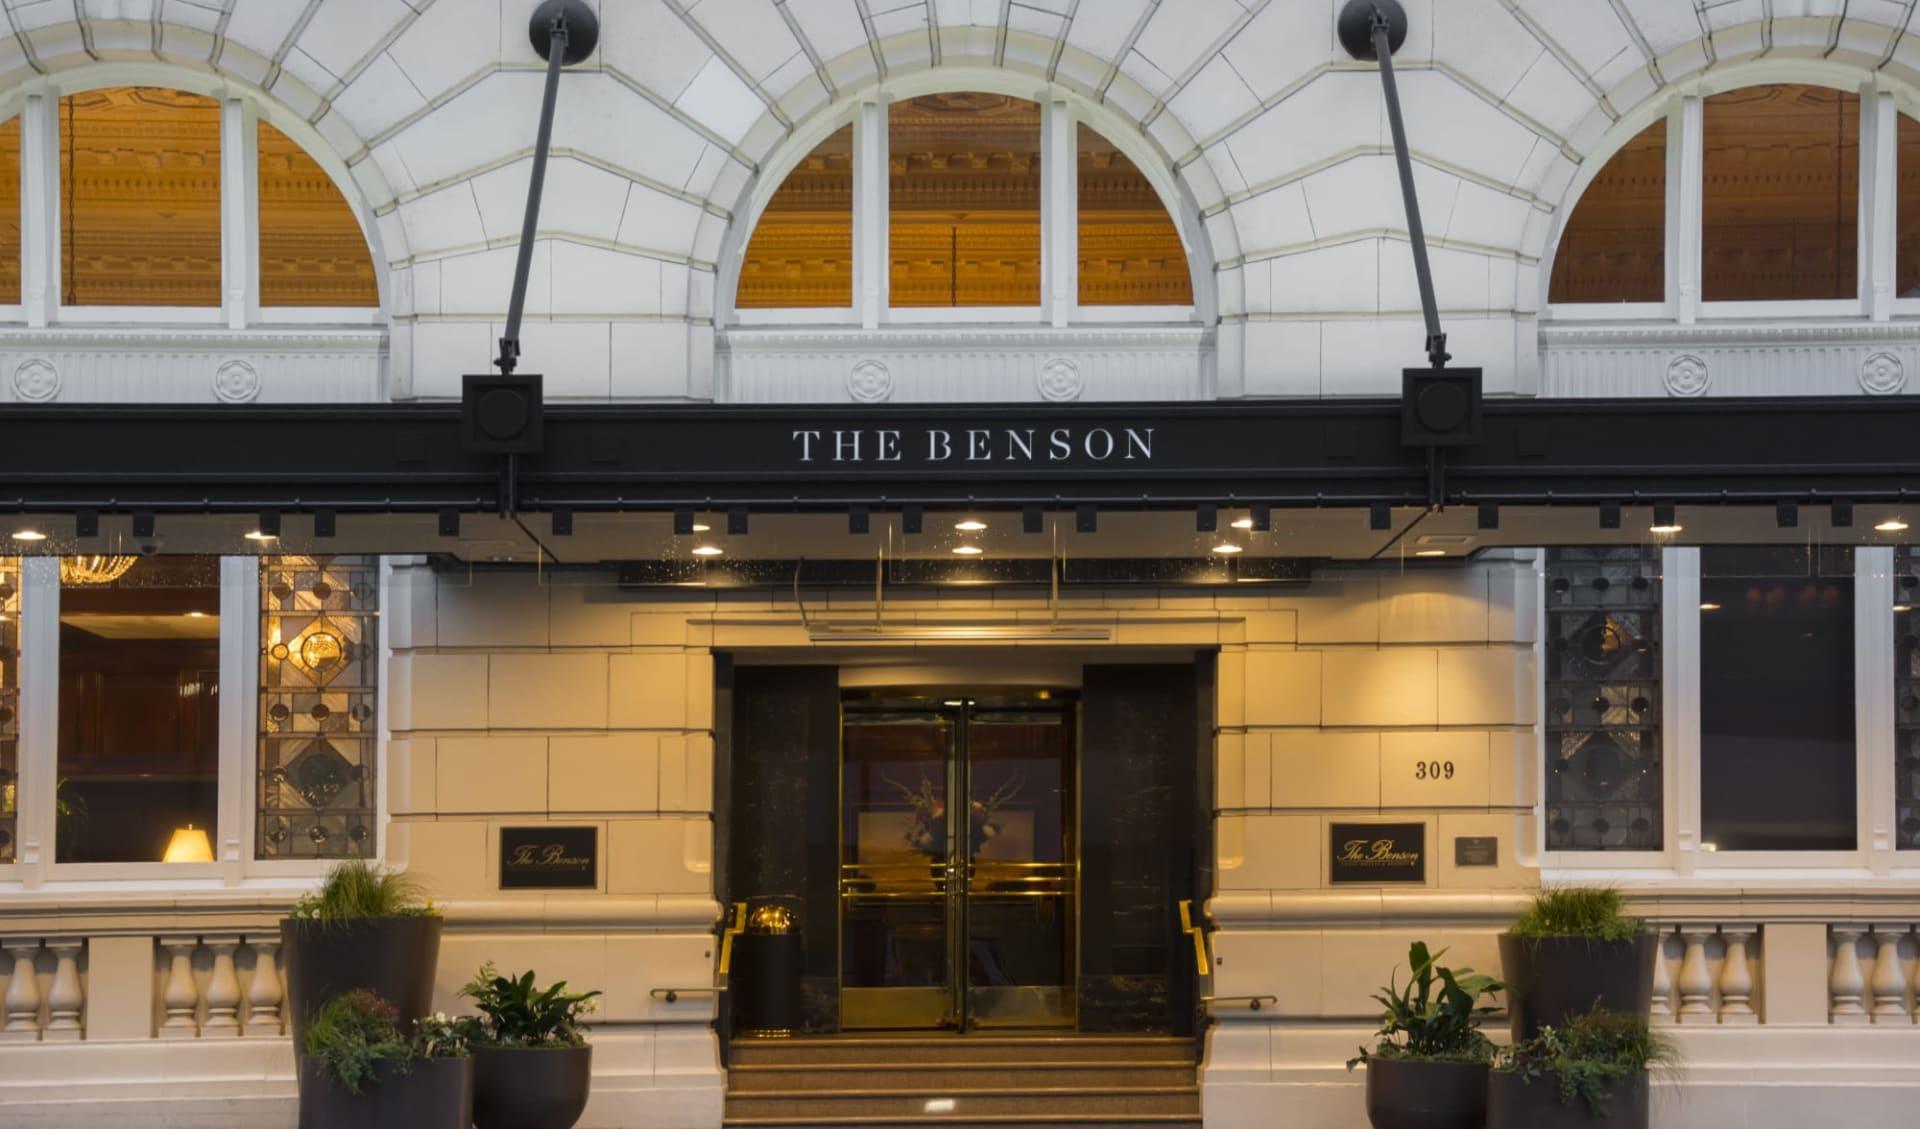 The Benson Hotel in Portland:  Benson 1A